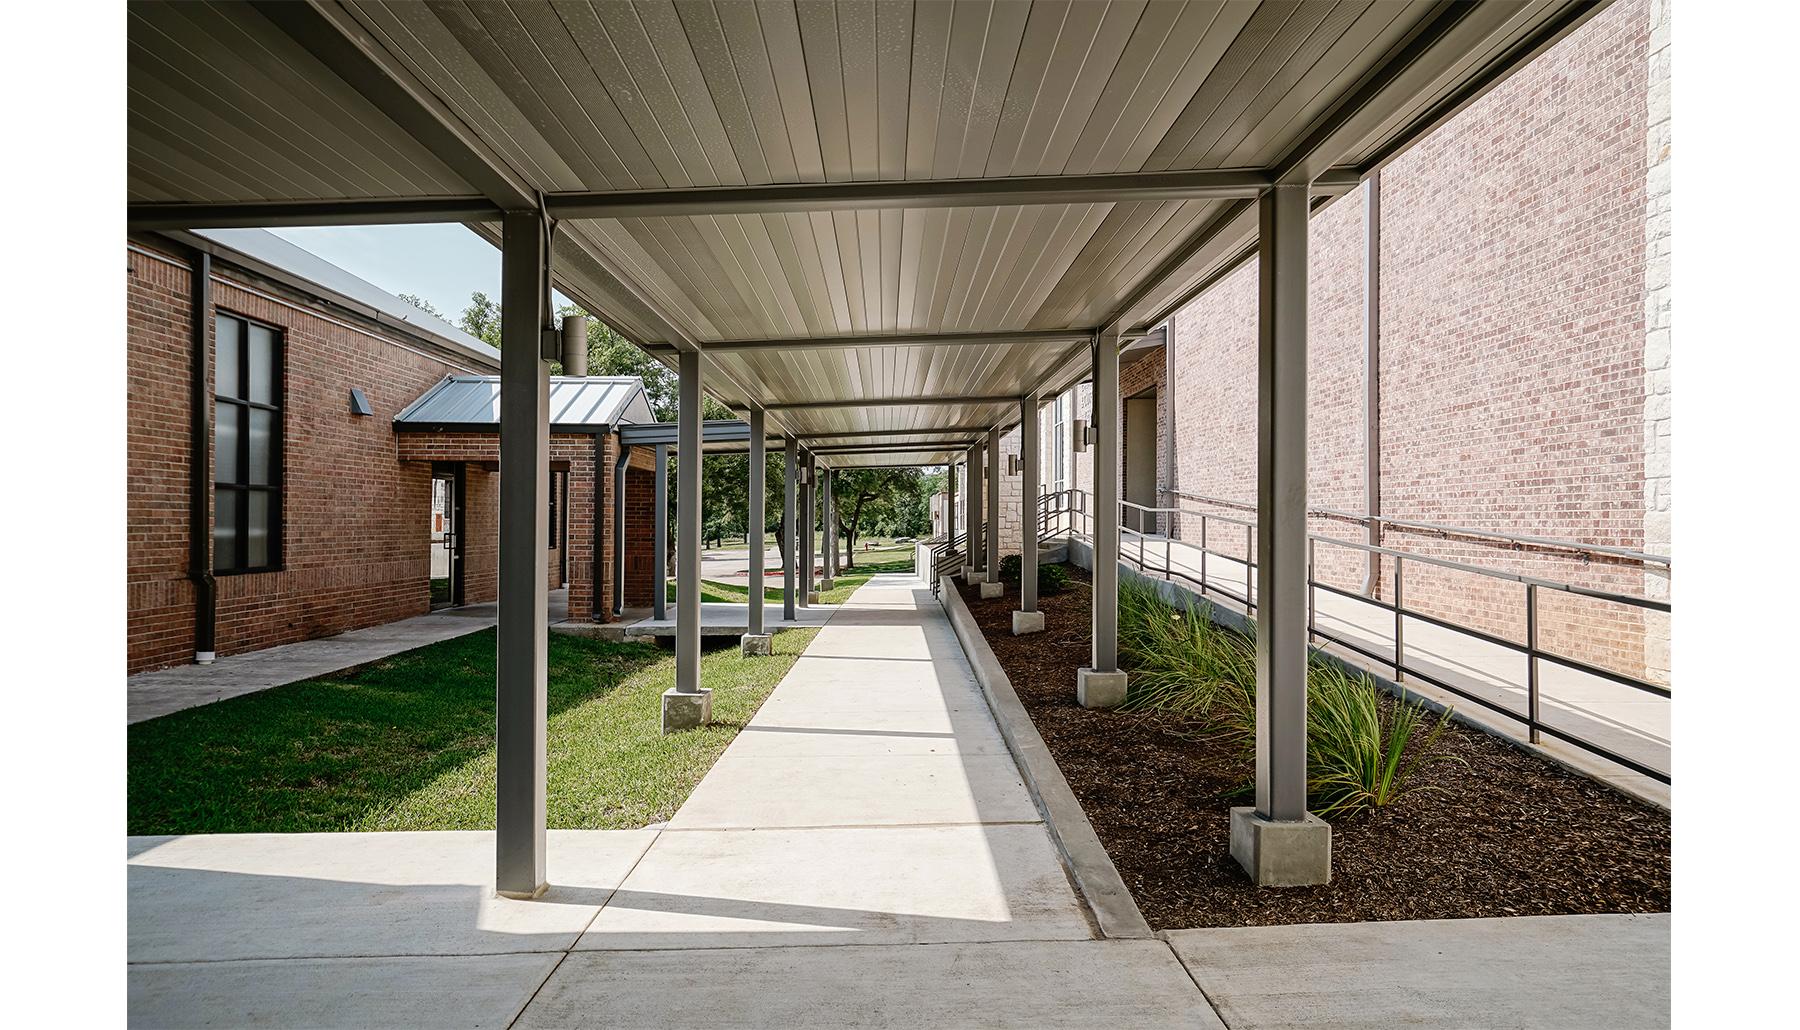 Westside Church Exterior Corridor